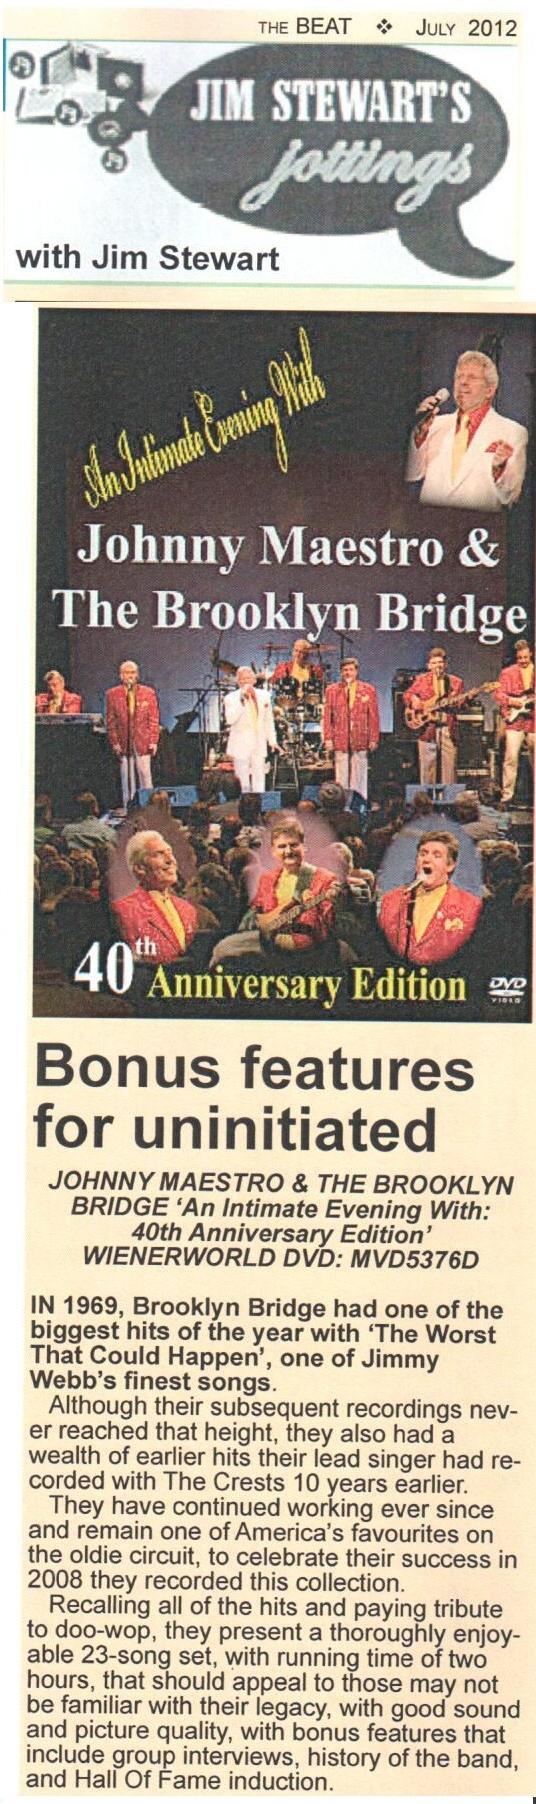 Johnny Maestro & The Brooklyn Bridge - 40th Anniversary Edition-706